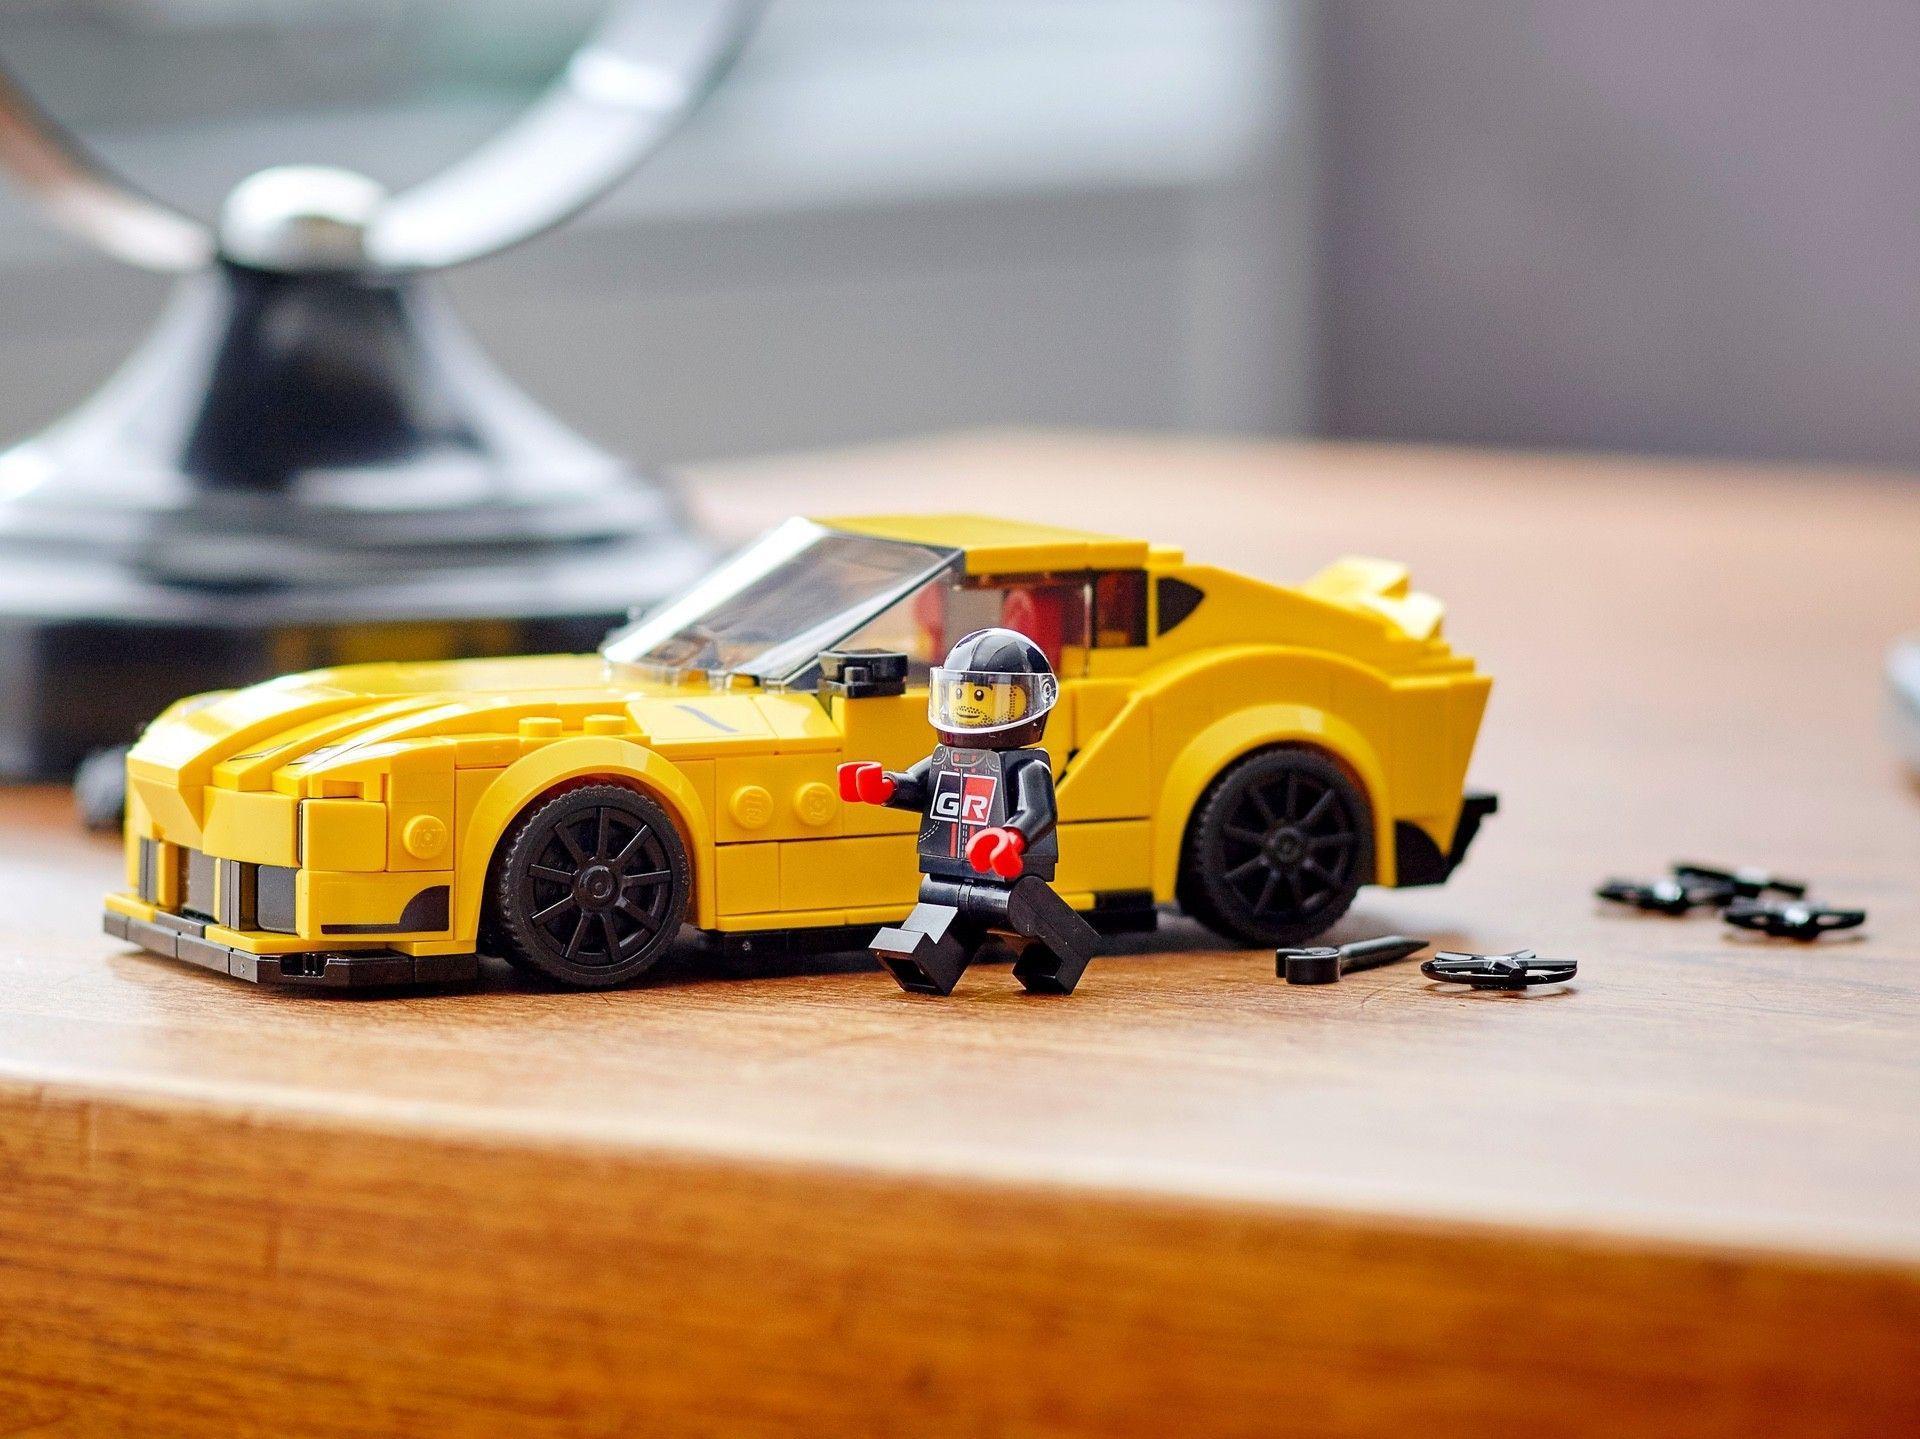 Toyota_GR_Supra_lego-0004